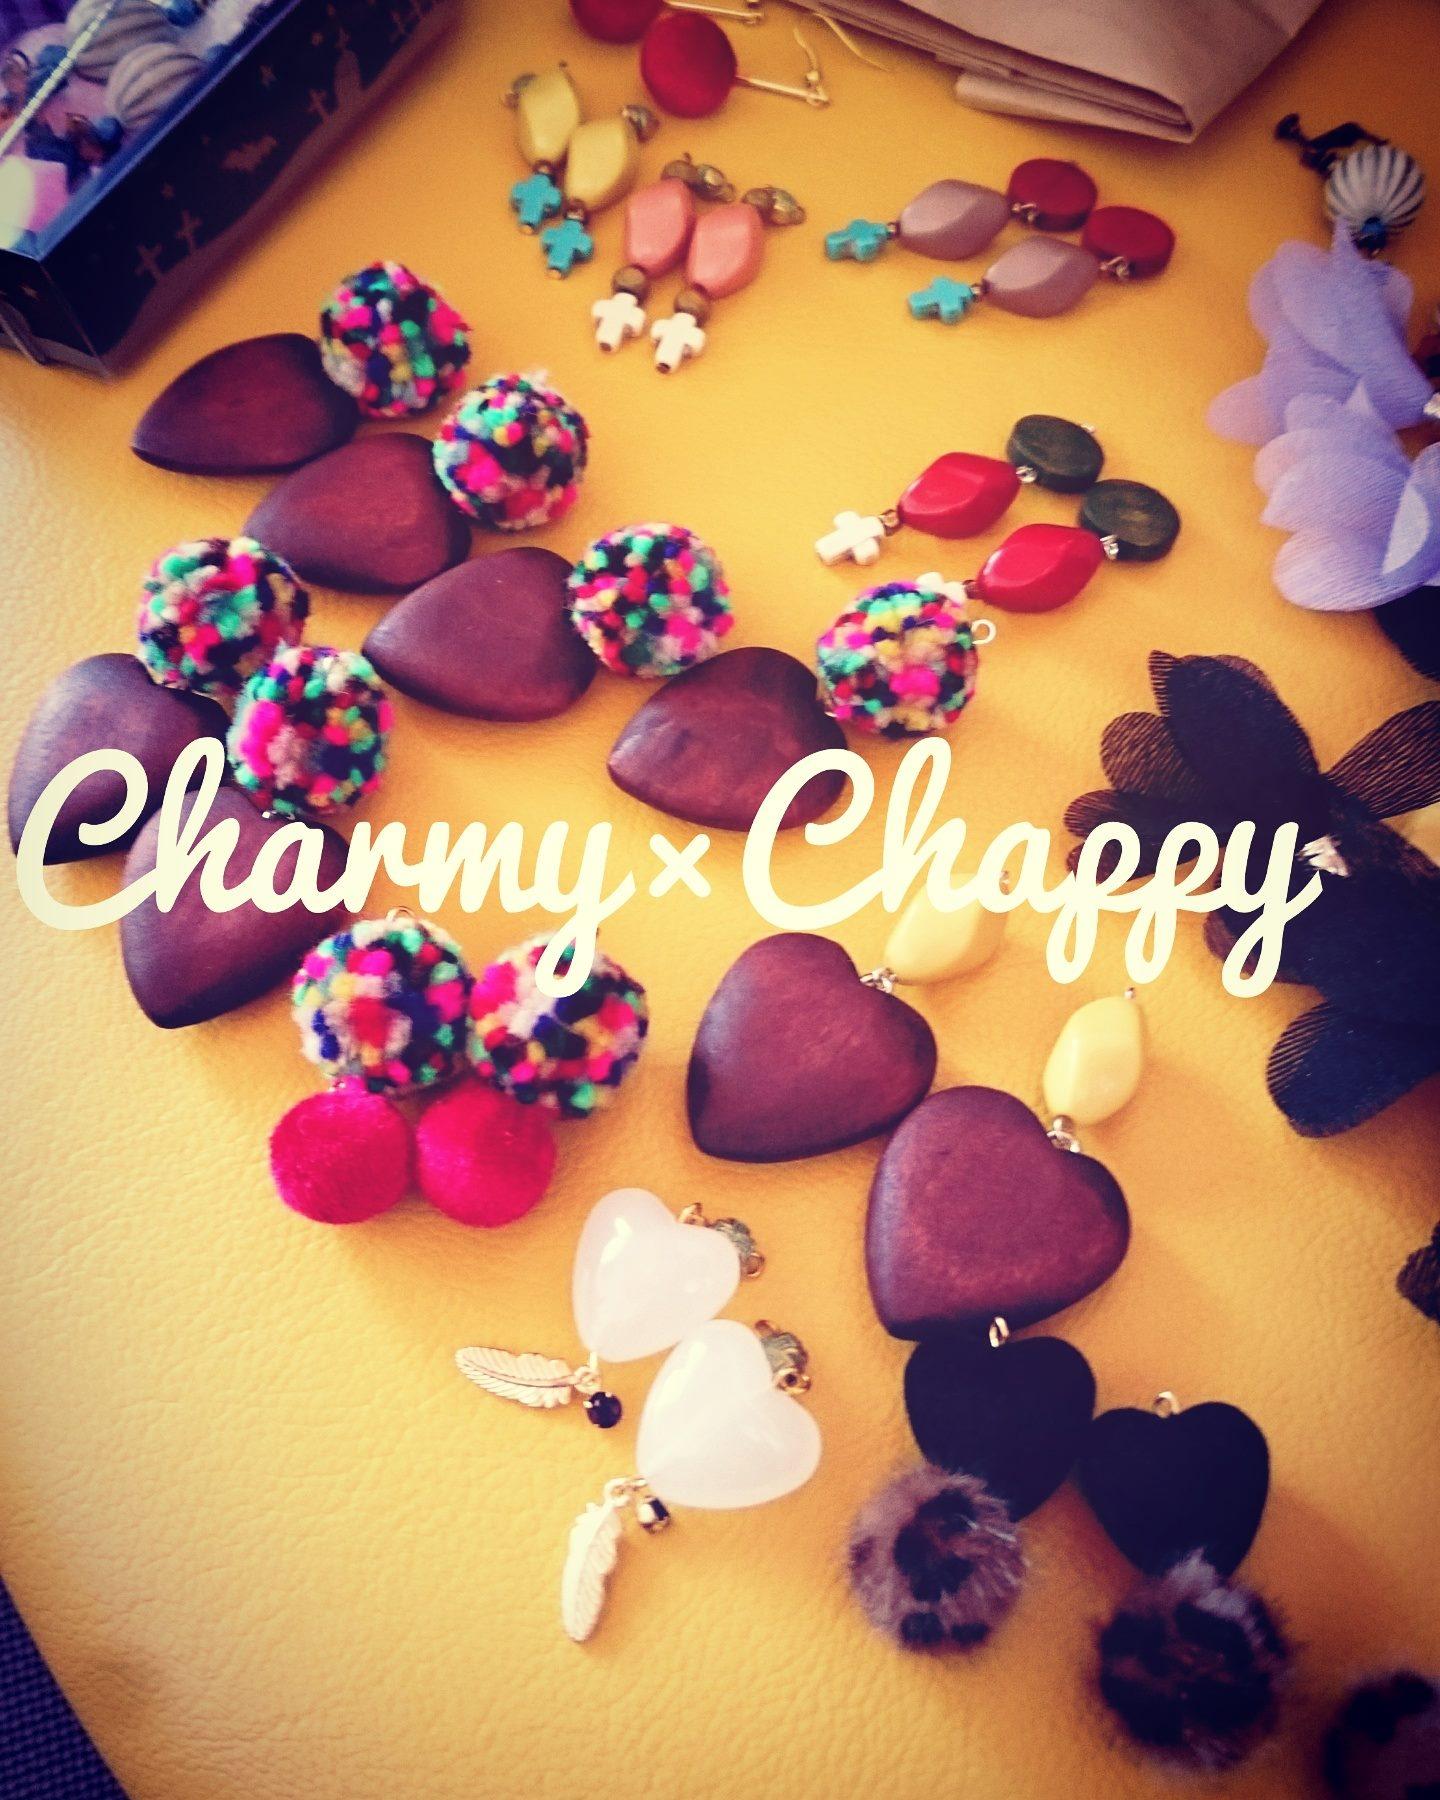 Charmy×Chappy